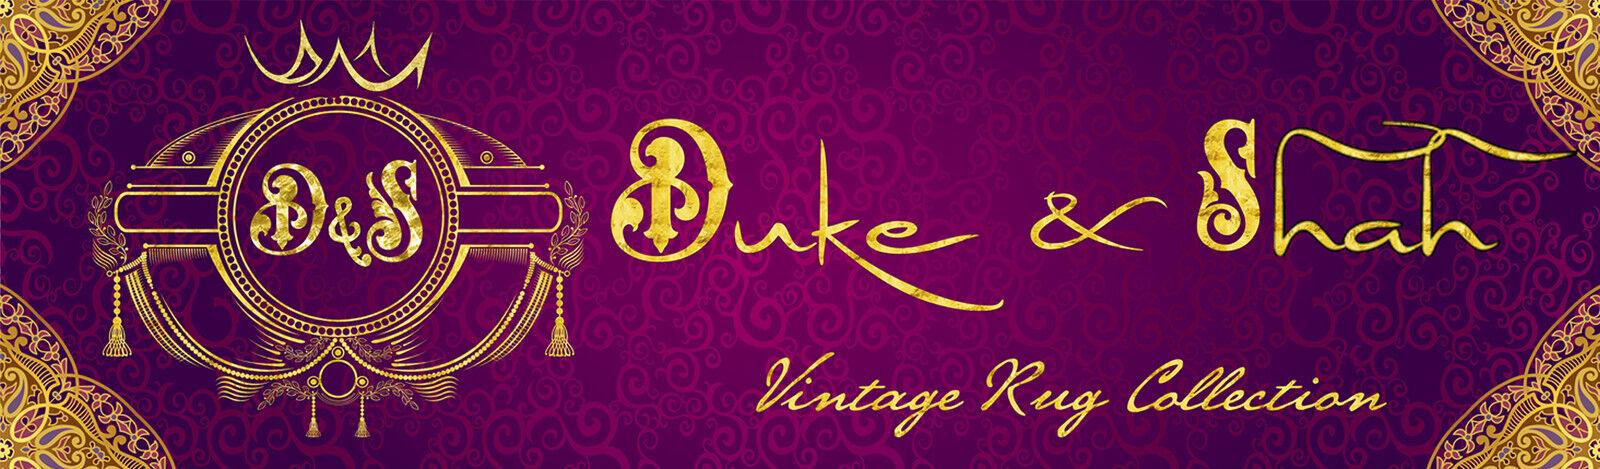 Duke & Shah Vintage Rug Collection